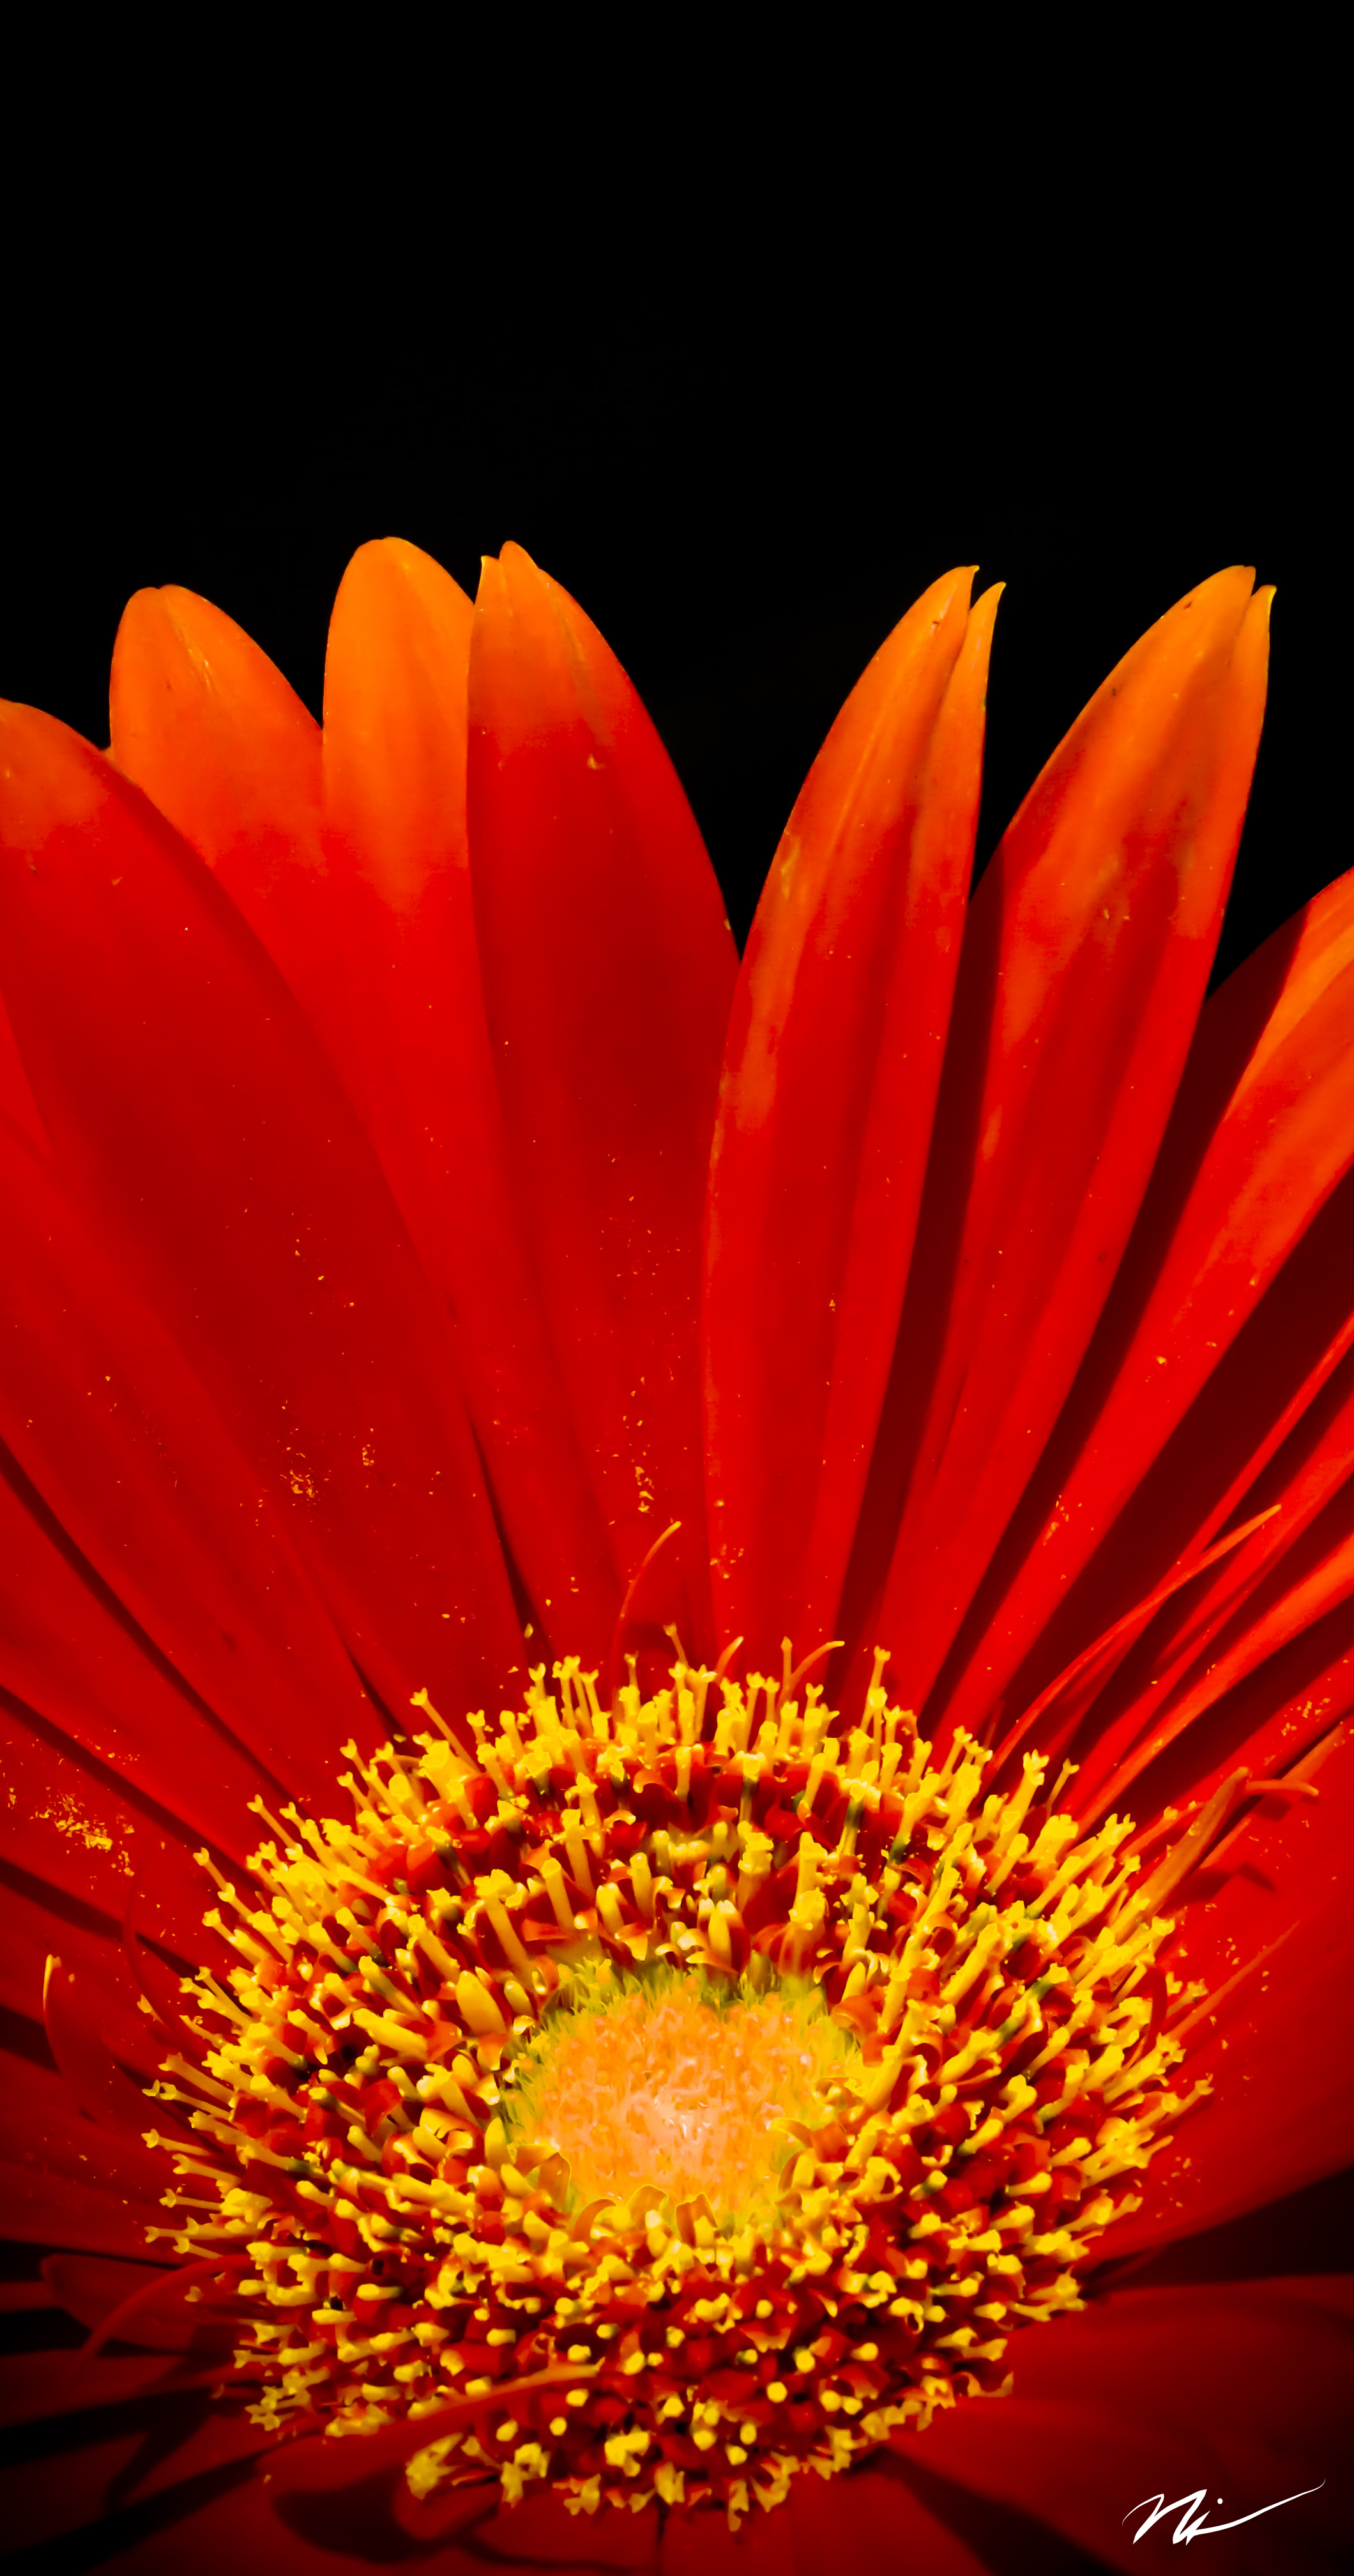 Red Gerbera Daisy.jpg